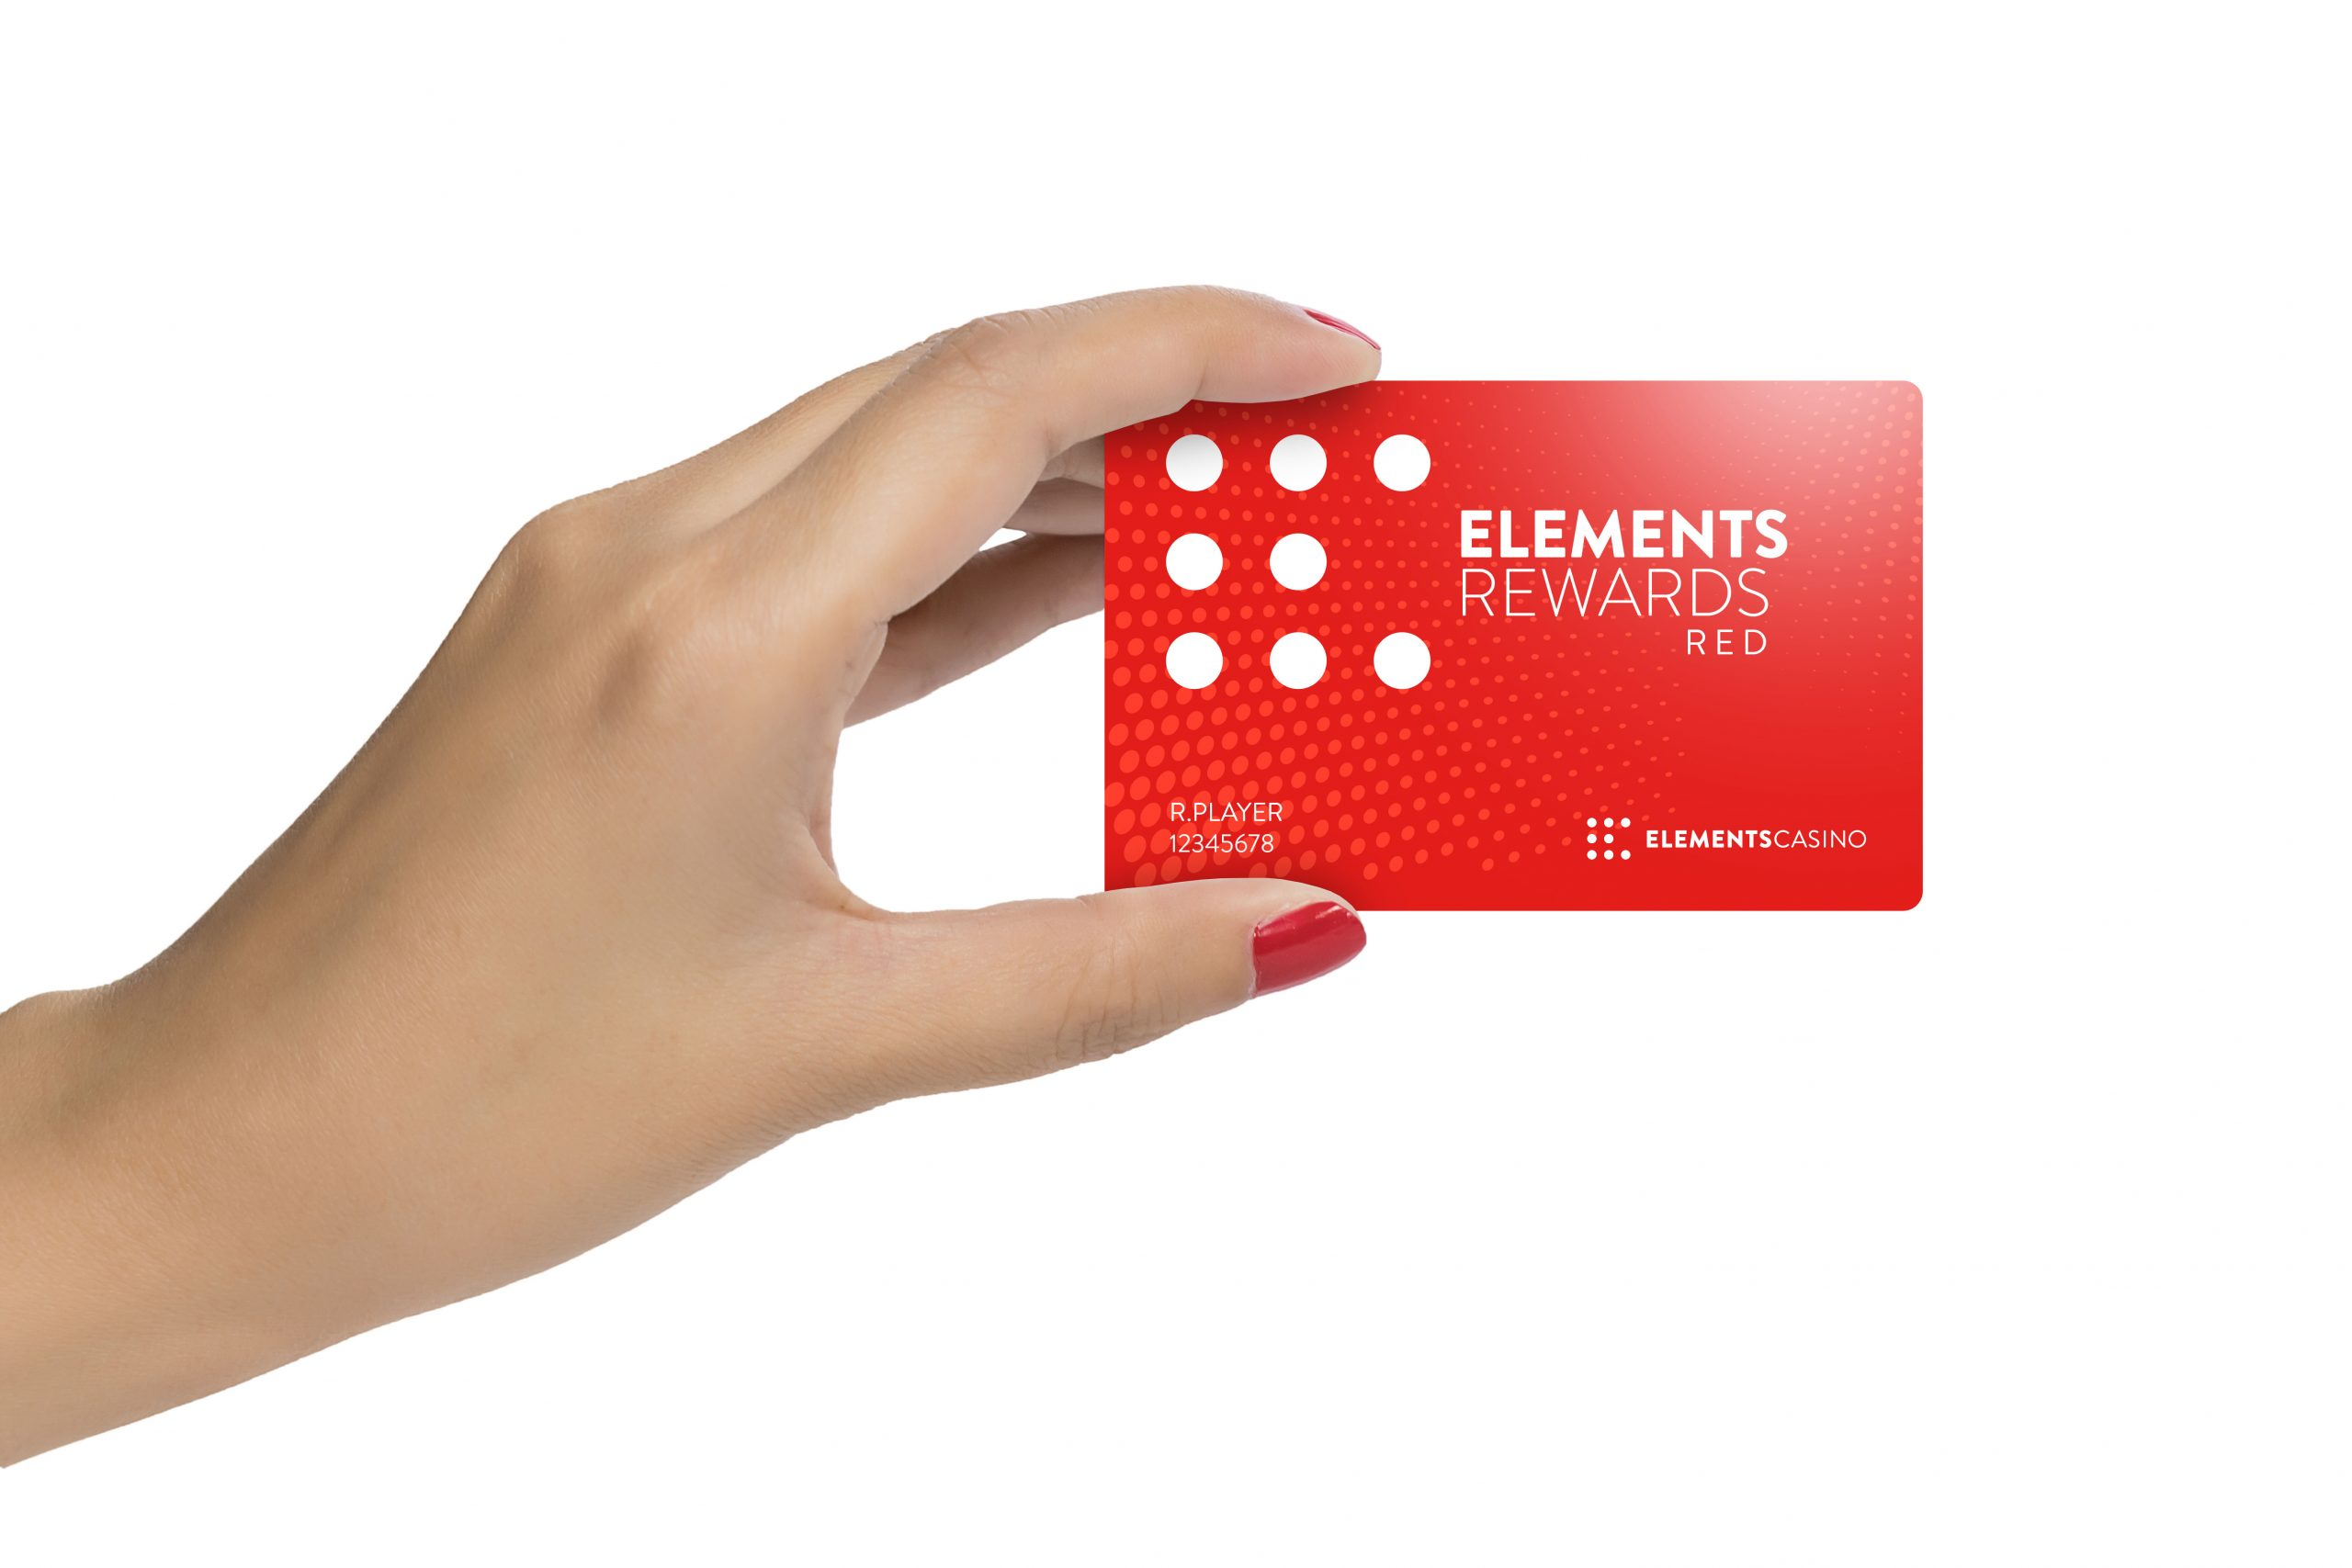 Elements Rewards Red Card